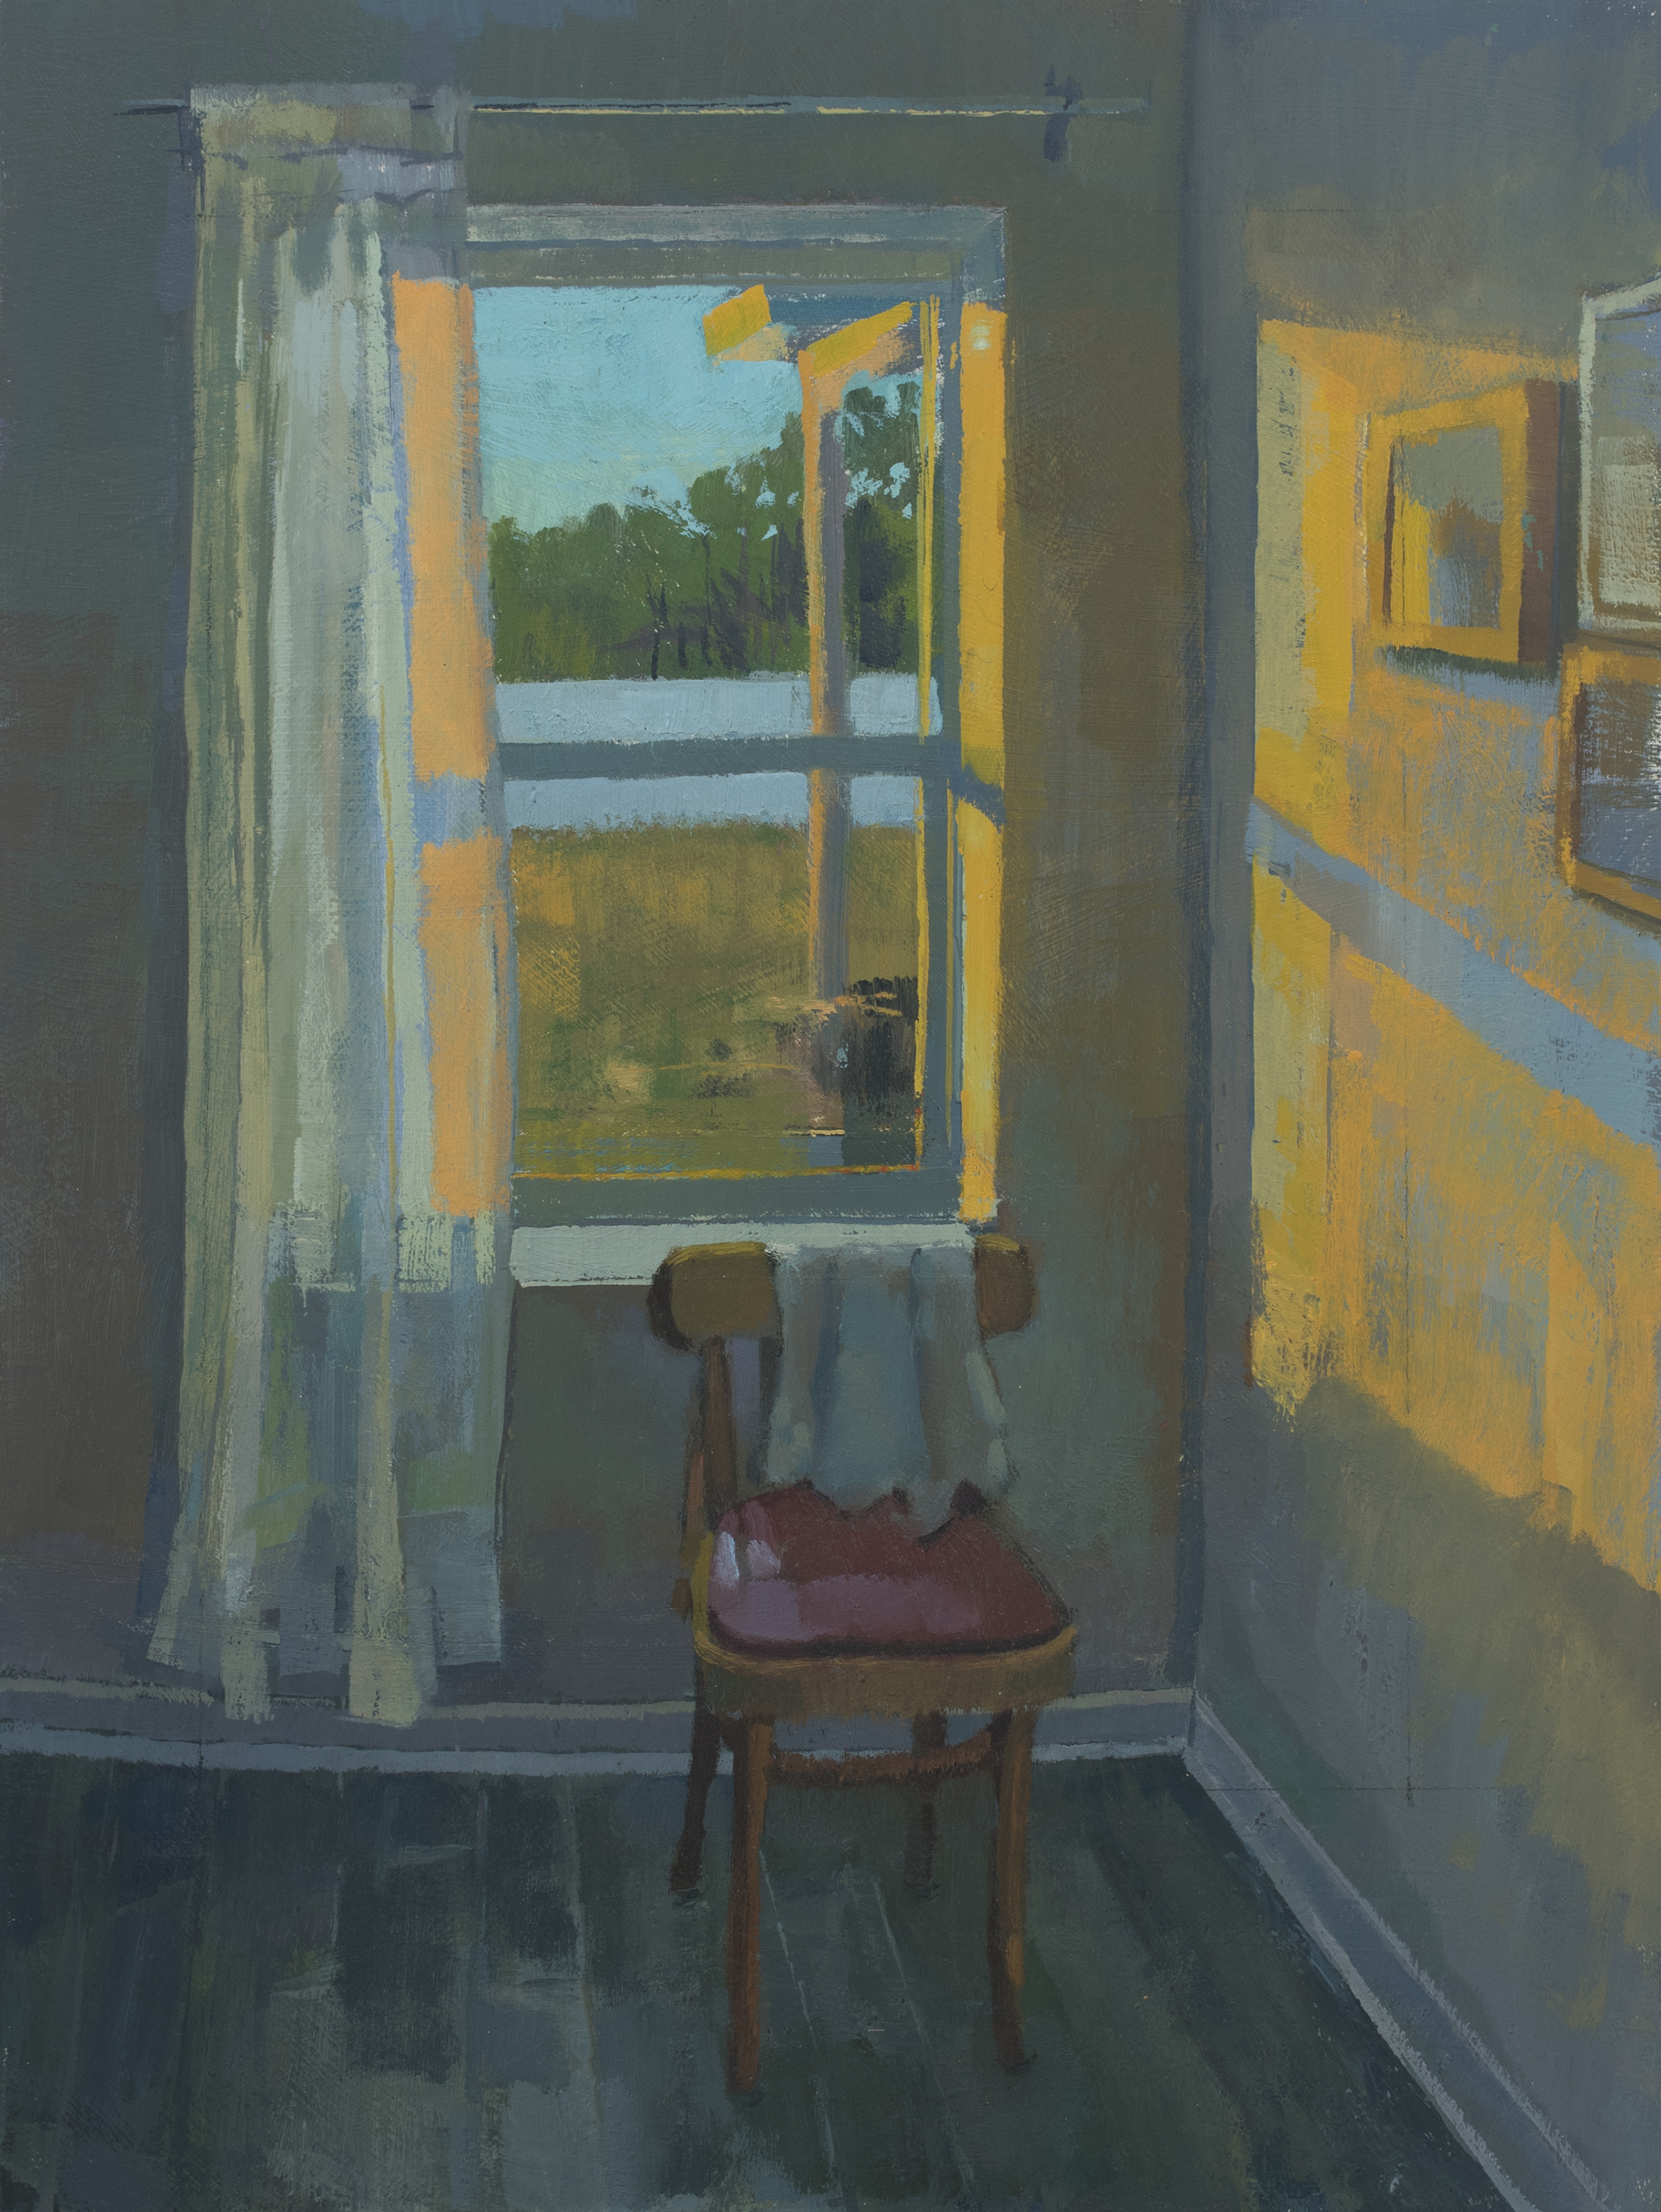 "Drained the Last Light, Oil on Panel, 16"" x 12"", 2018"